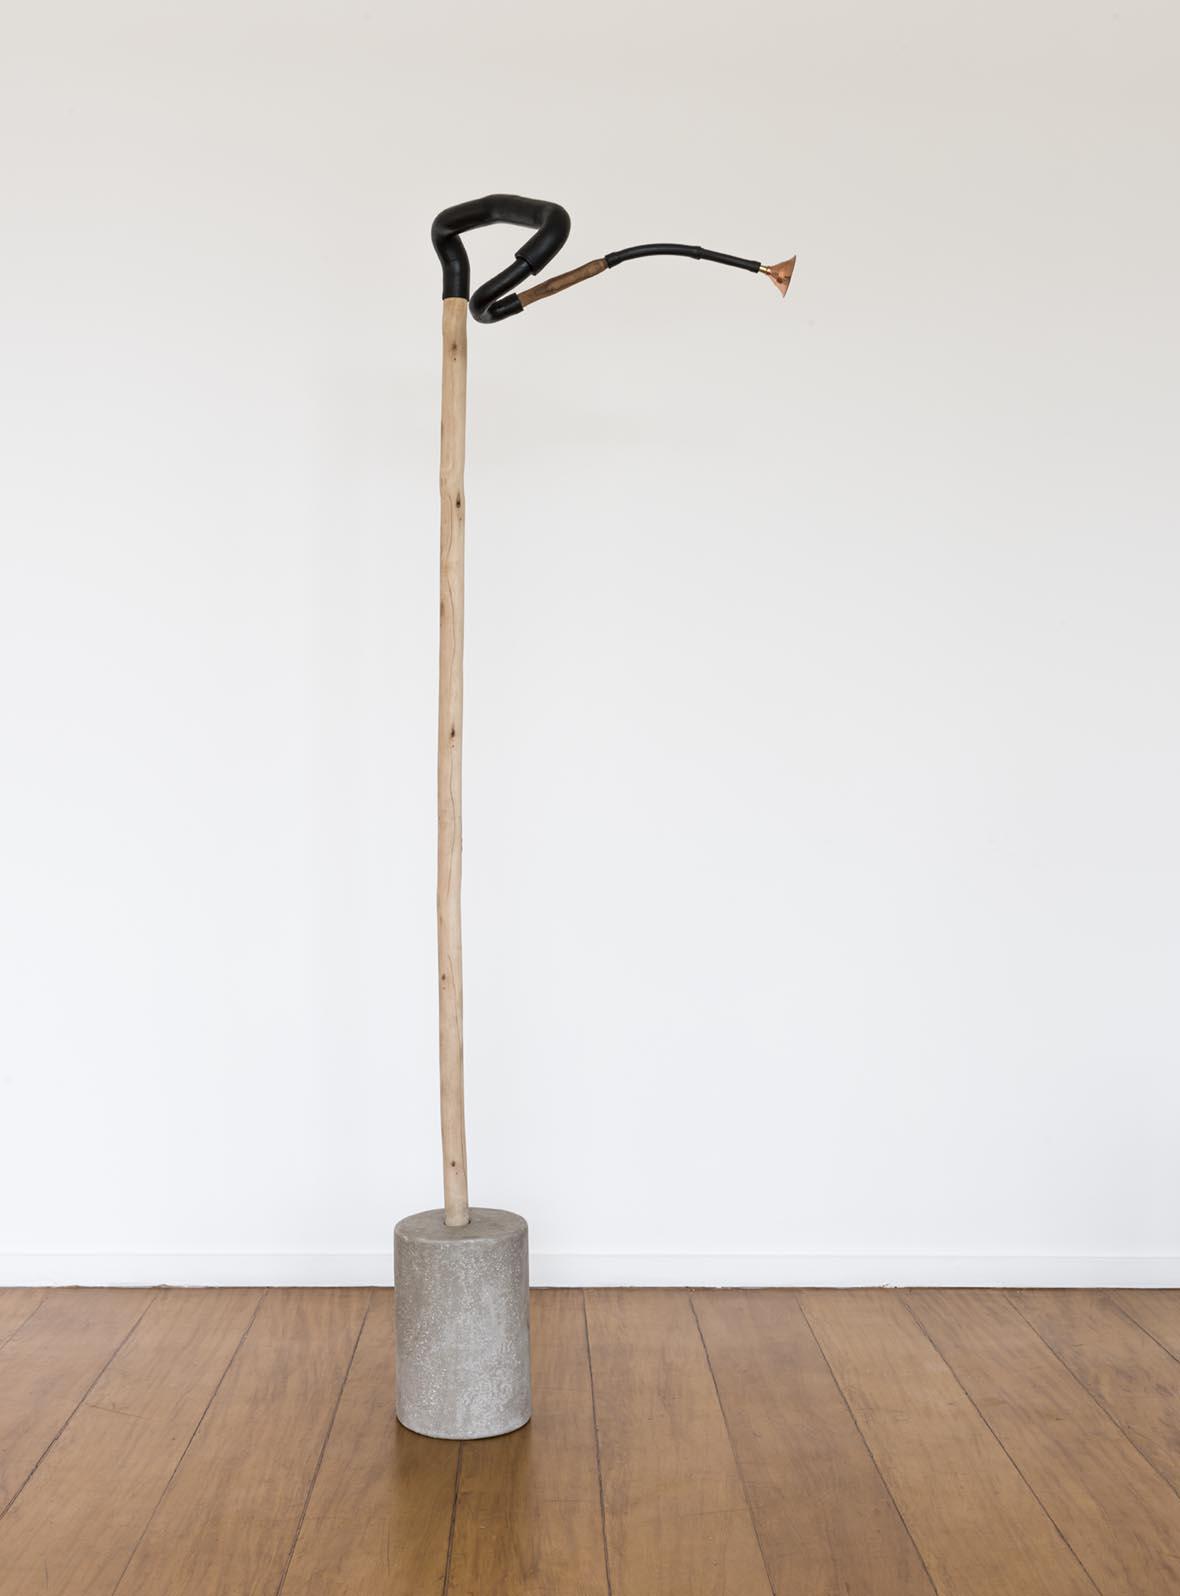 Claudio Cretti  Sem título    Untitled,  2017 Cimento, madeira, borracha e madeira   Cement, wood, rubber and wood ,182 x 55 x 21 cm